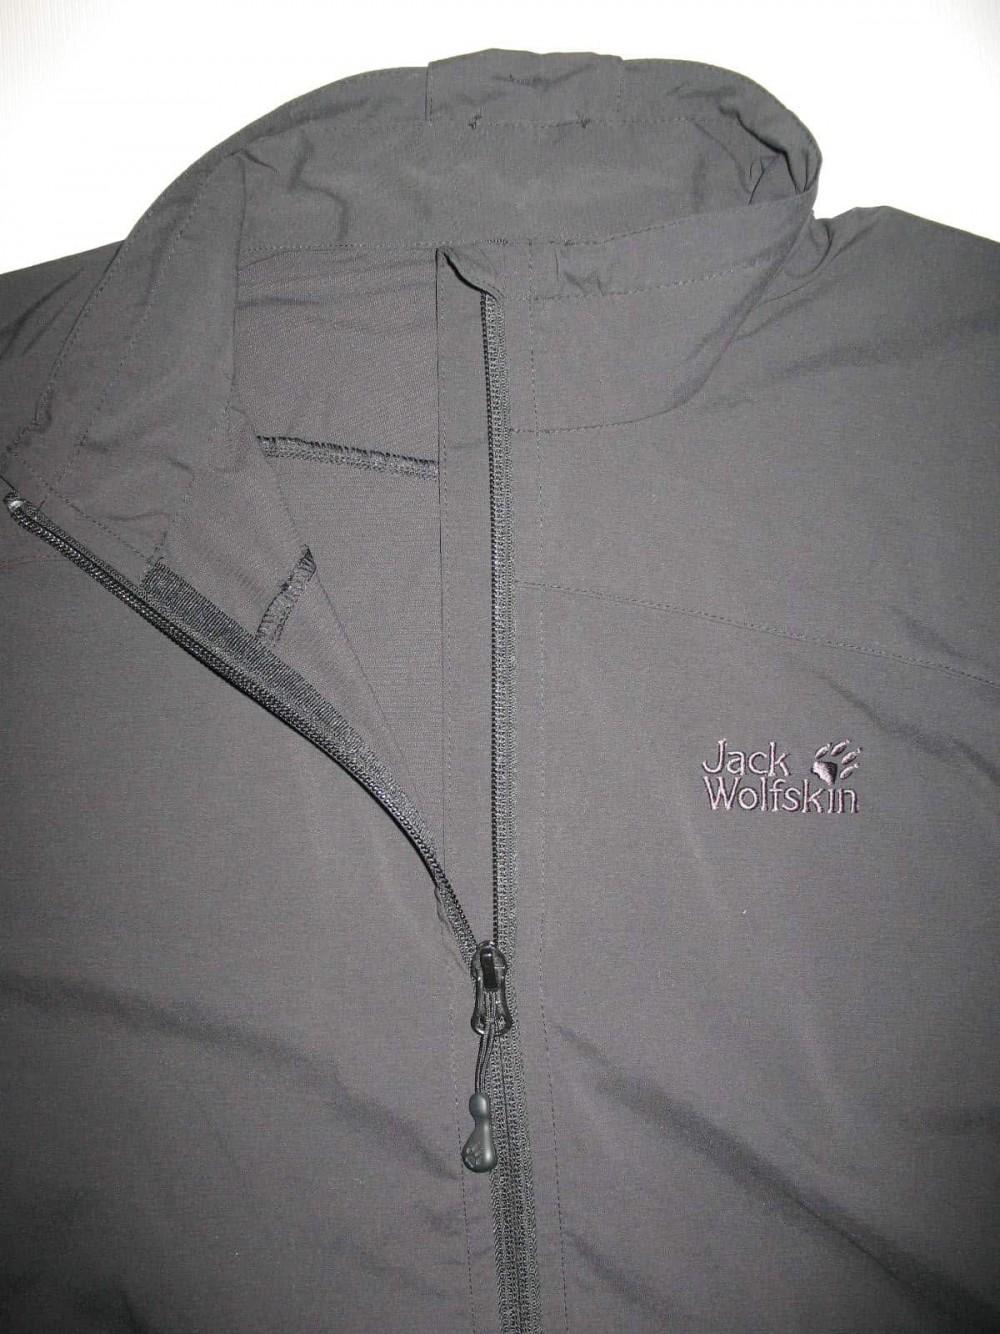 Жилет JACK WOLFSKIN activate softshell vest (размер XL)* - 4